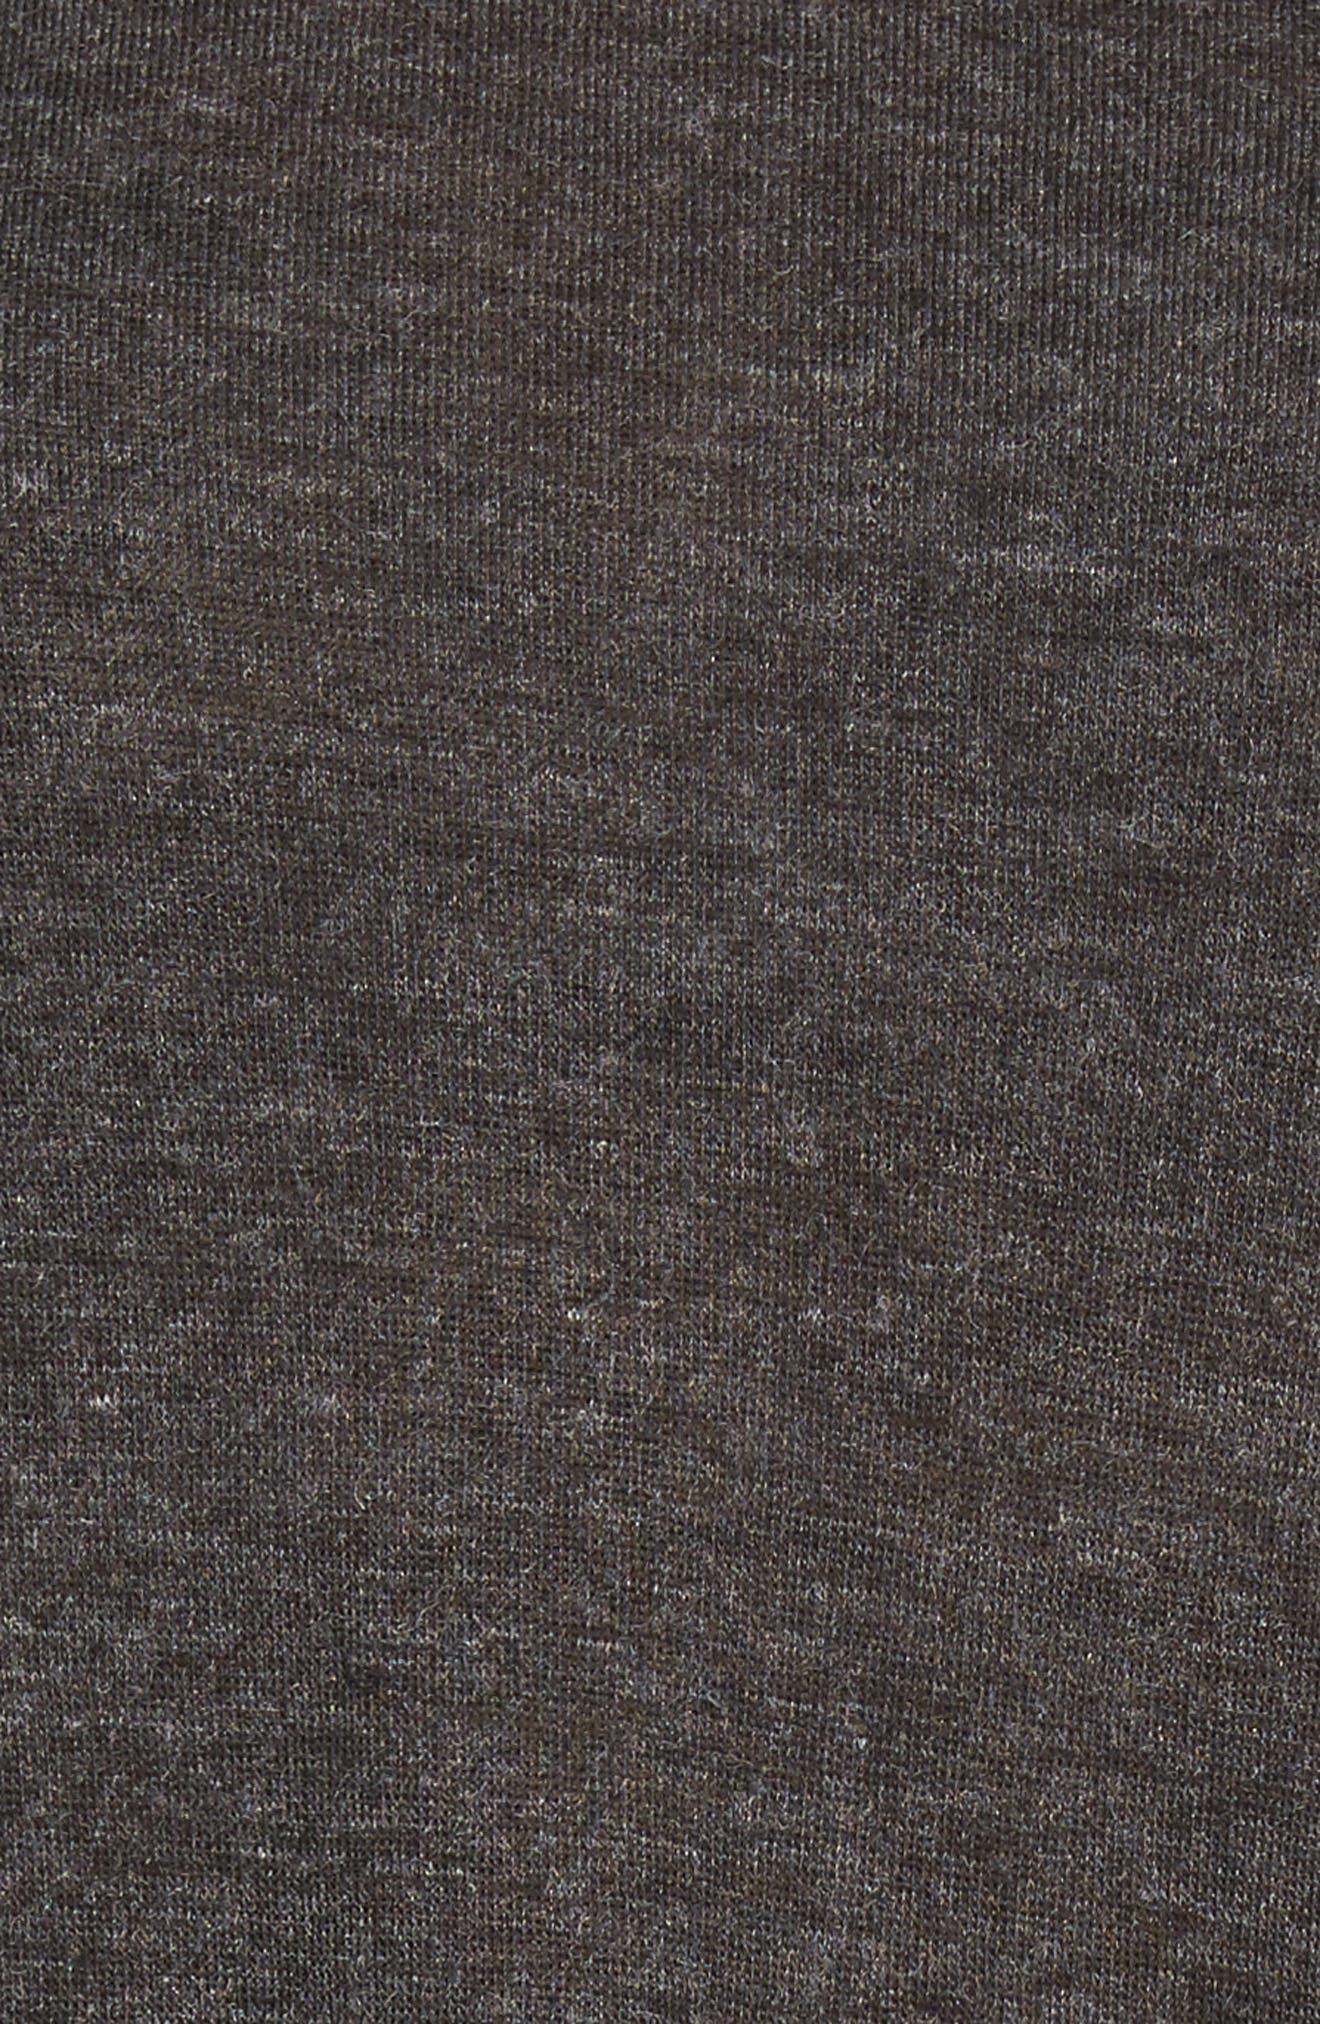 High/Low Tunic Sweatshirt,                             Alternate thumbnail 5, color,                             001